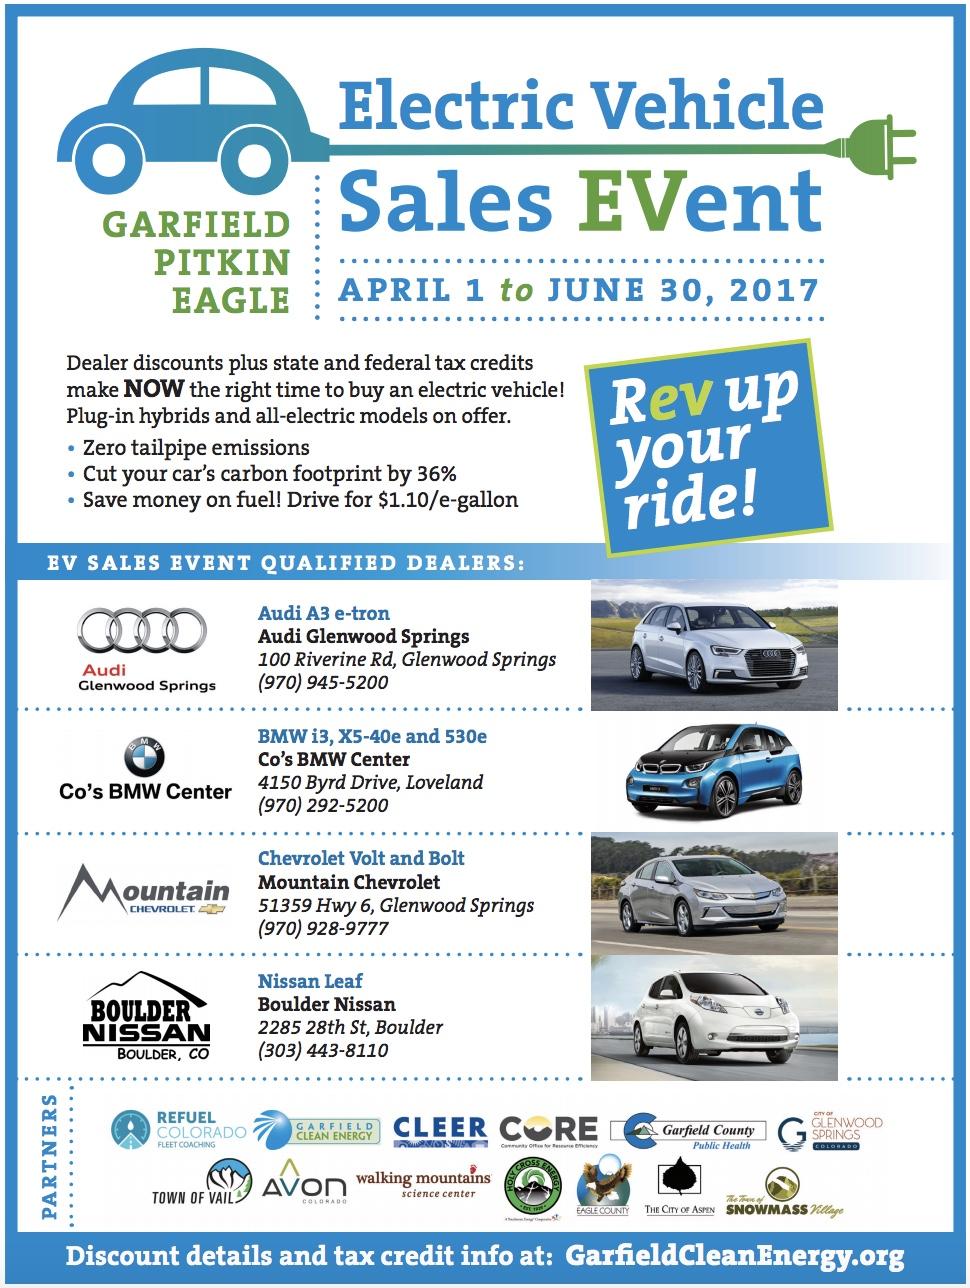 Garfield_EV sales event.jpeg